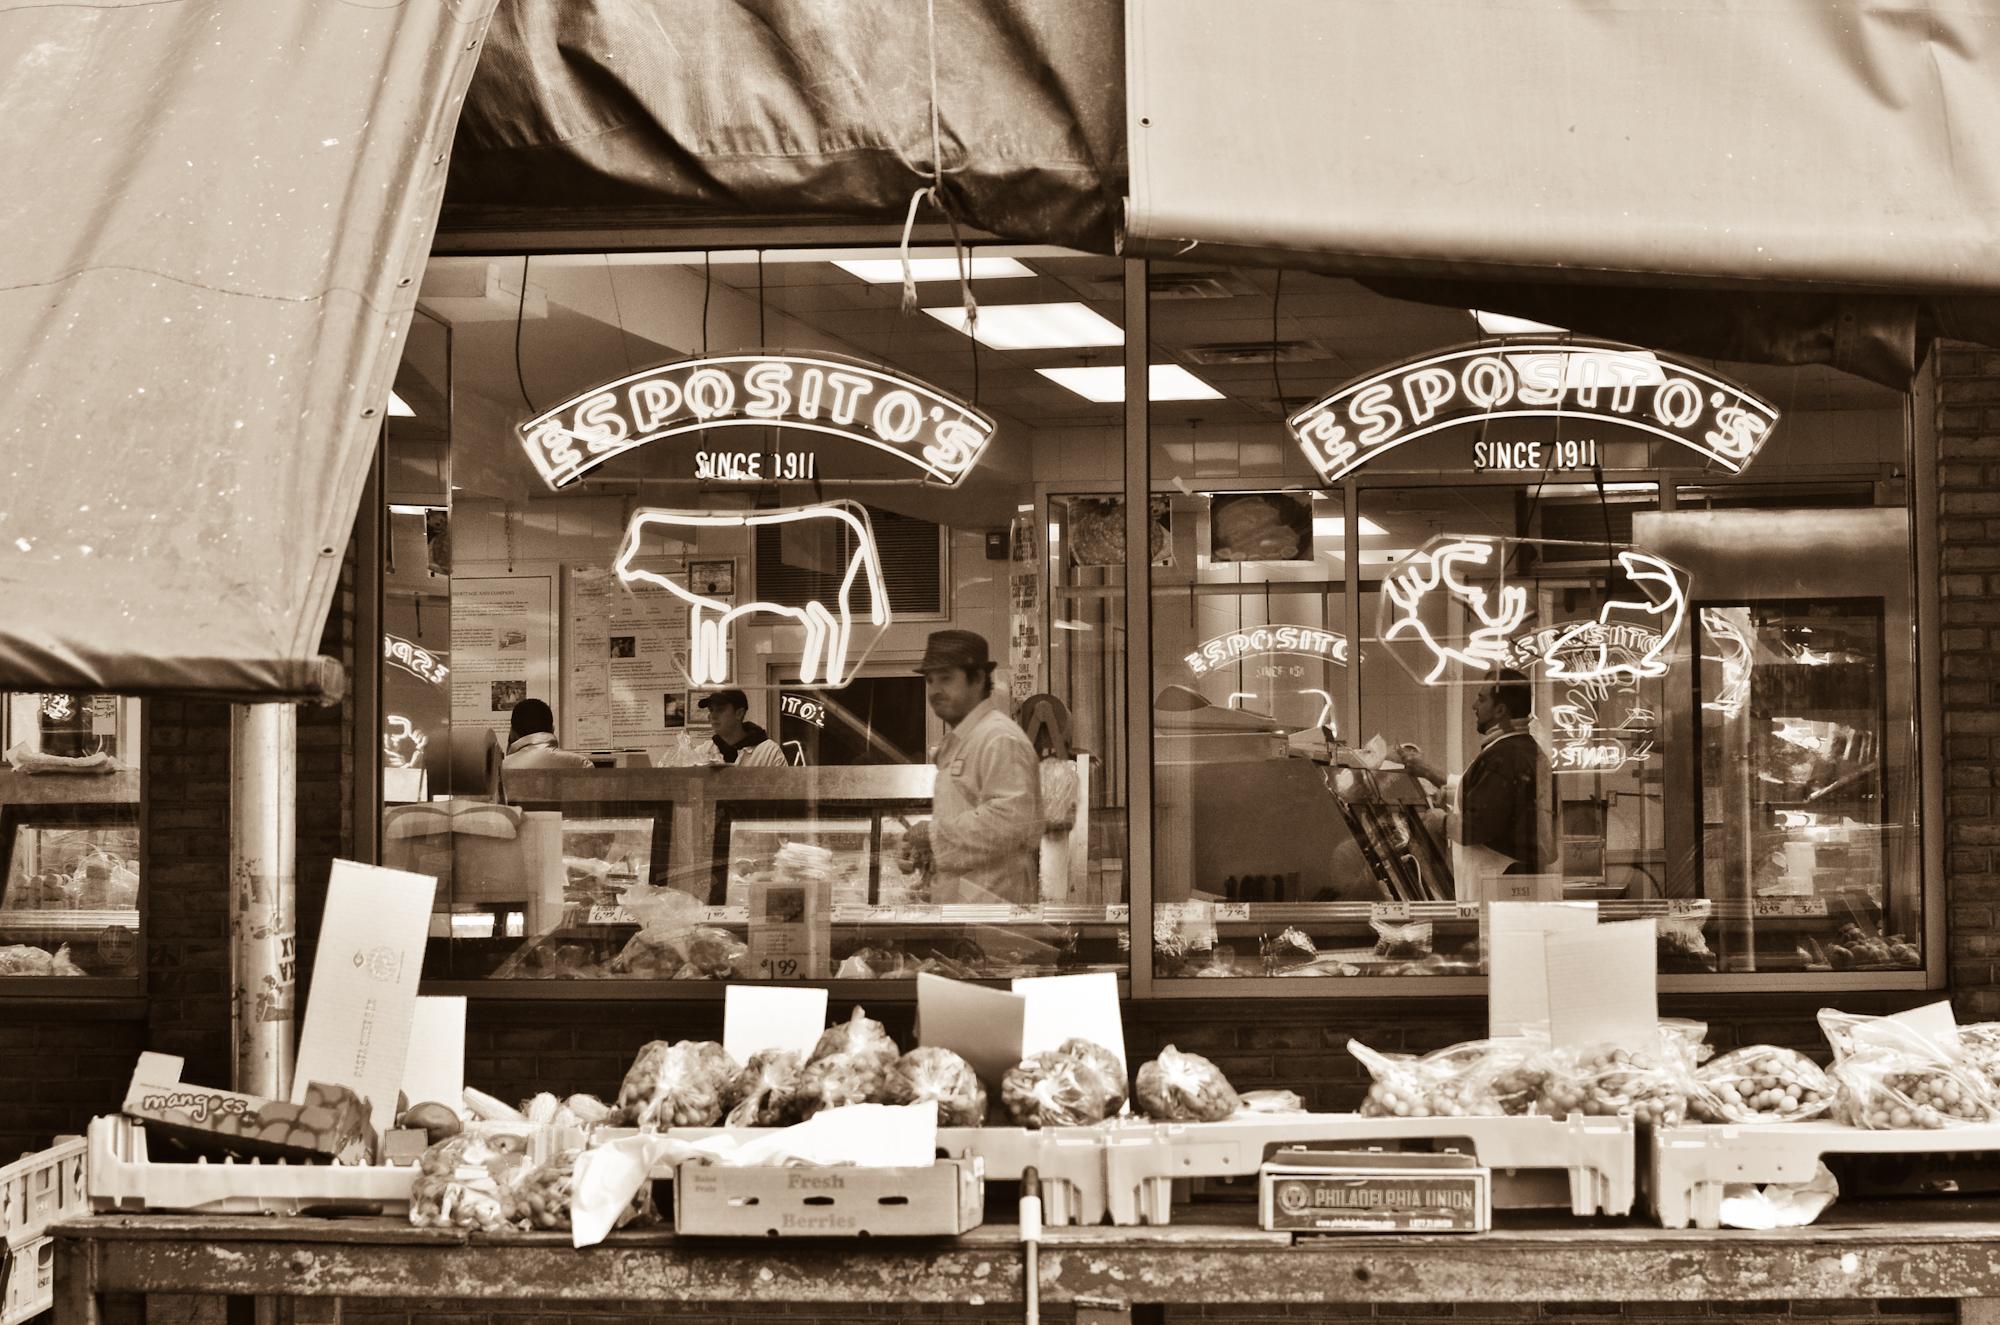 italian meat market, philadelphia 9th street market, esposito's meats philadelphia